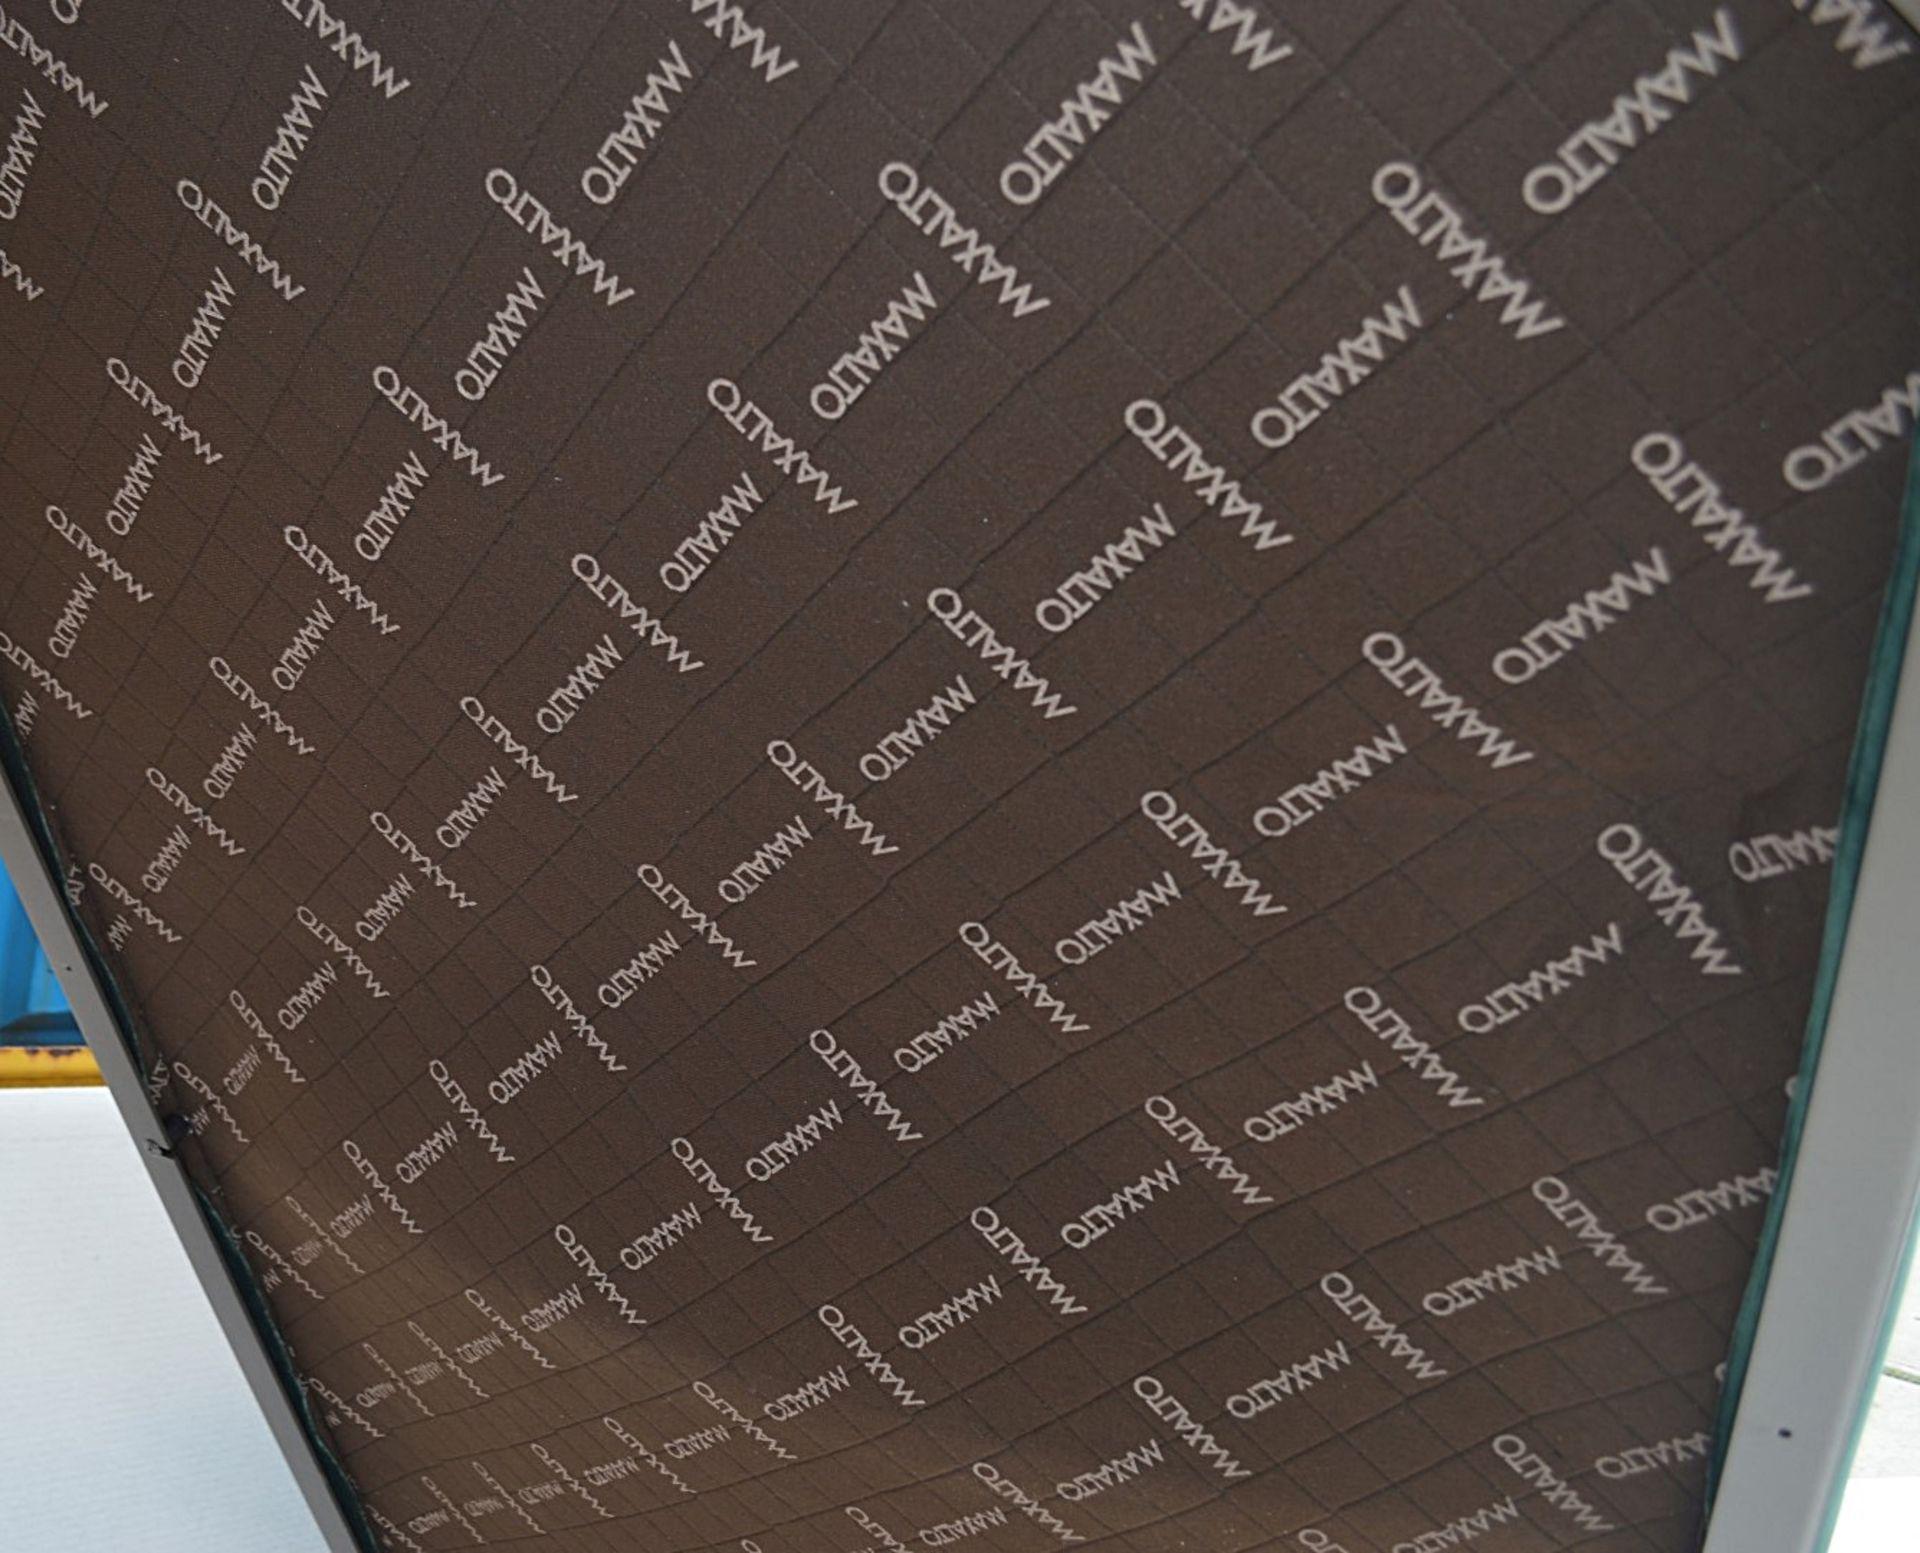 2 x B&B Italia MAXALTO Luxury Sofa Sections Both Upholstered In Rich Dark Green Velvet - RRP £7,248 - Image 9 of 13